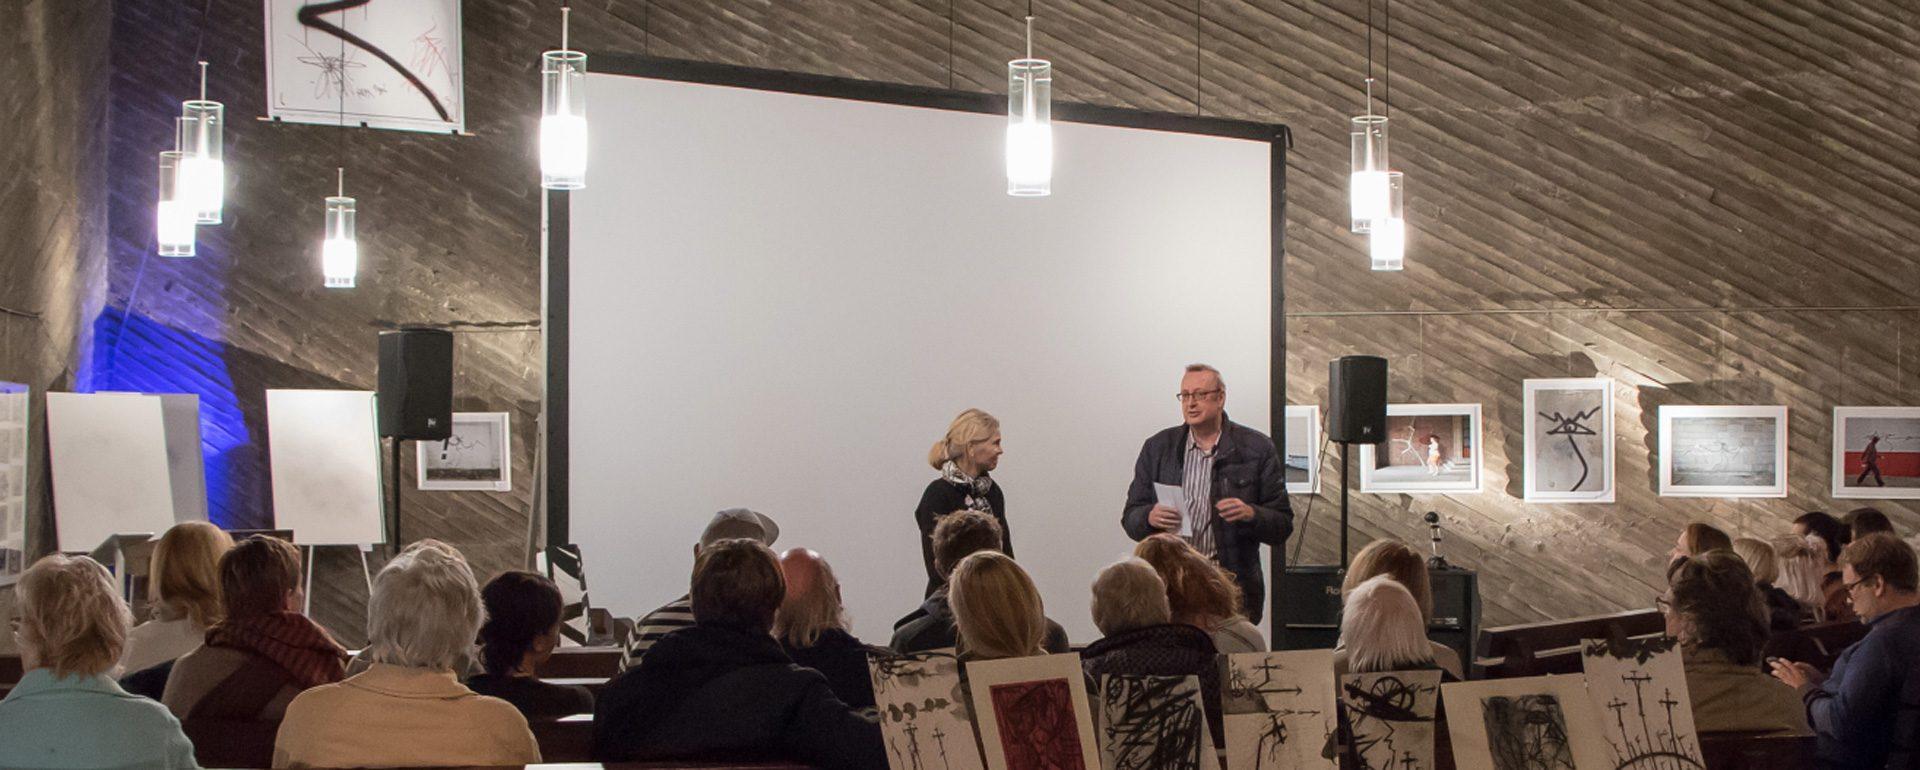 kurzfilmreihe sk stiftung kultur köln GAG kulturkirche Ost